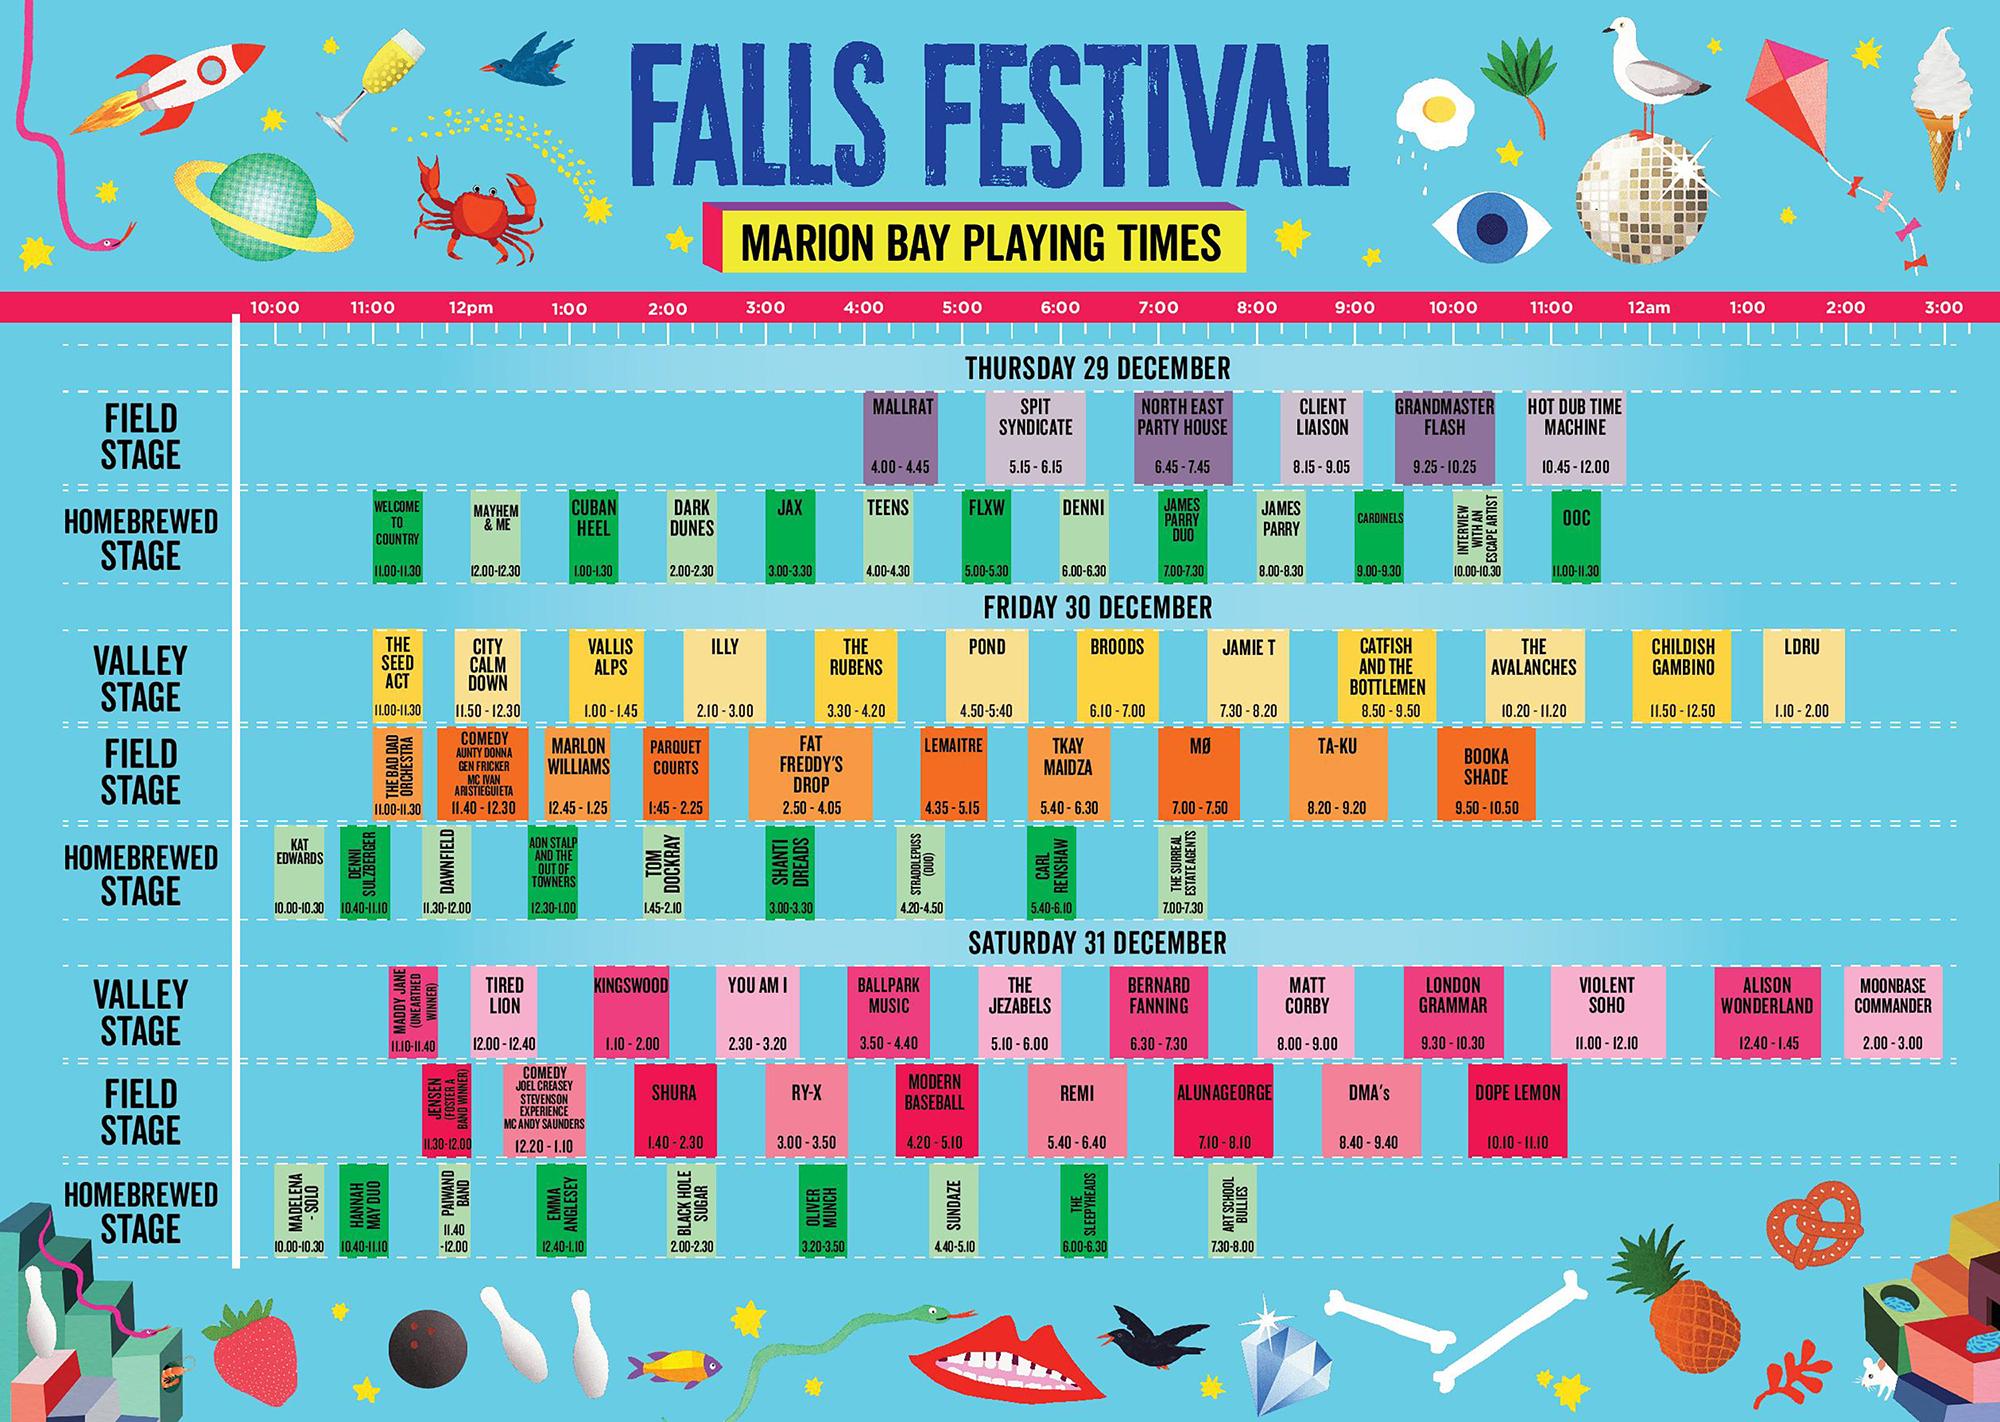 Falls_2016_PlayingTimes_Marion